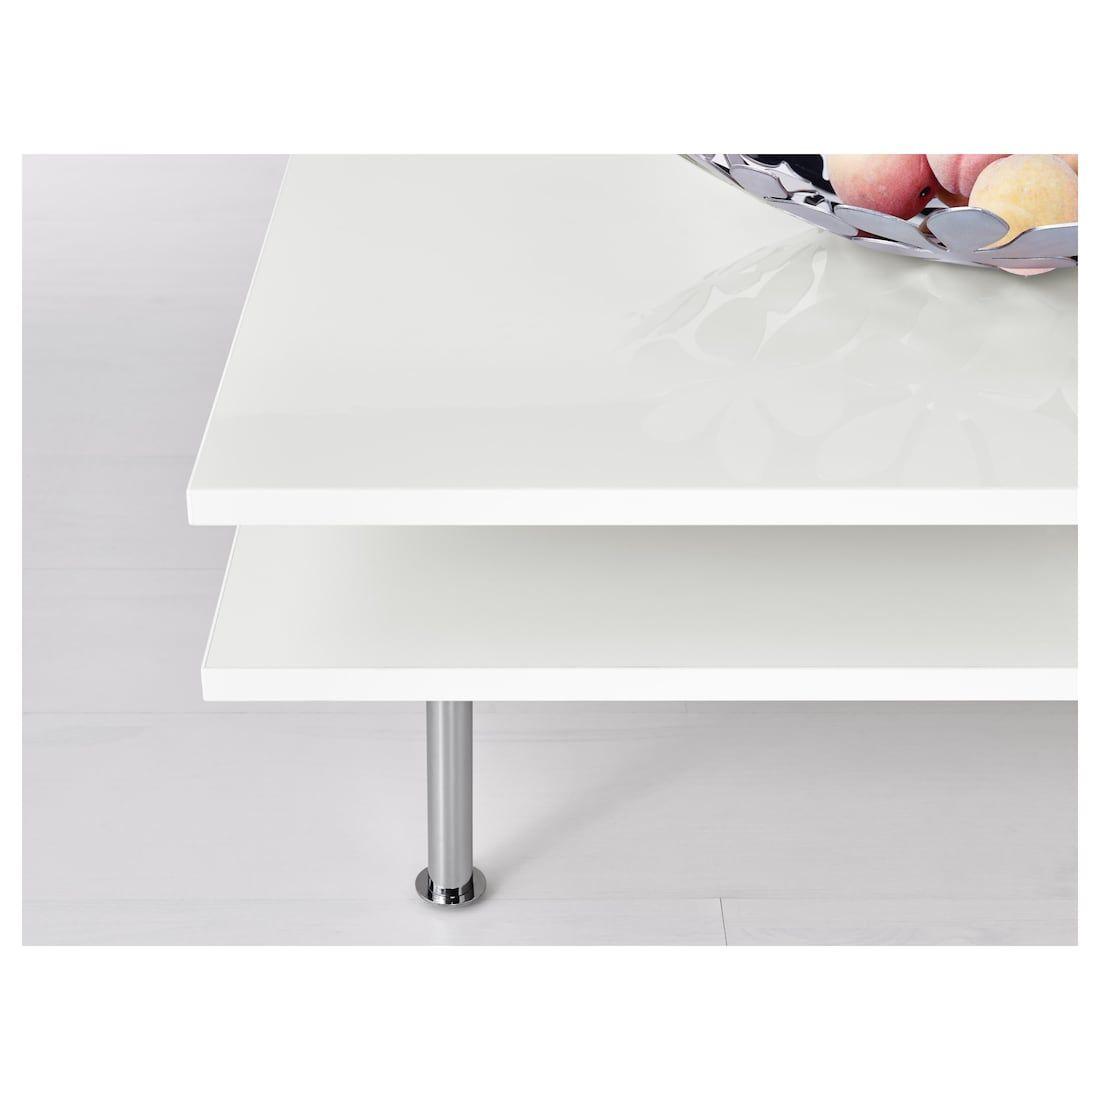 White High Gloss Coffee Table Ikea Coffee Table Coffee Table White Modern Coffee Tables [ 892 x 1228 Pixel ]